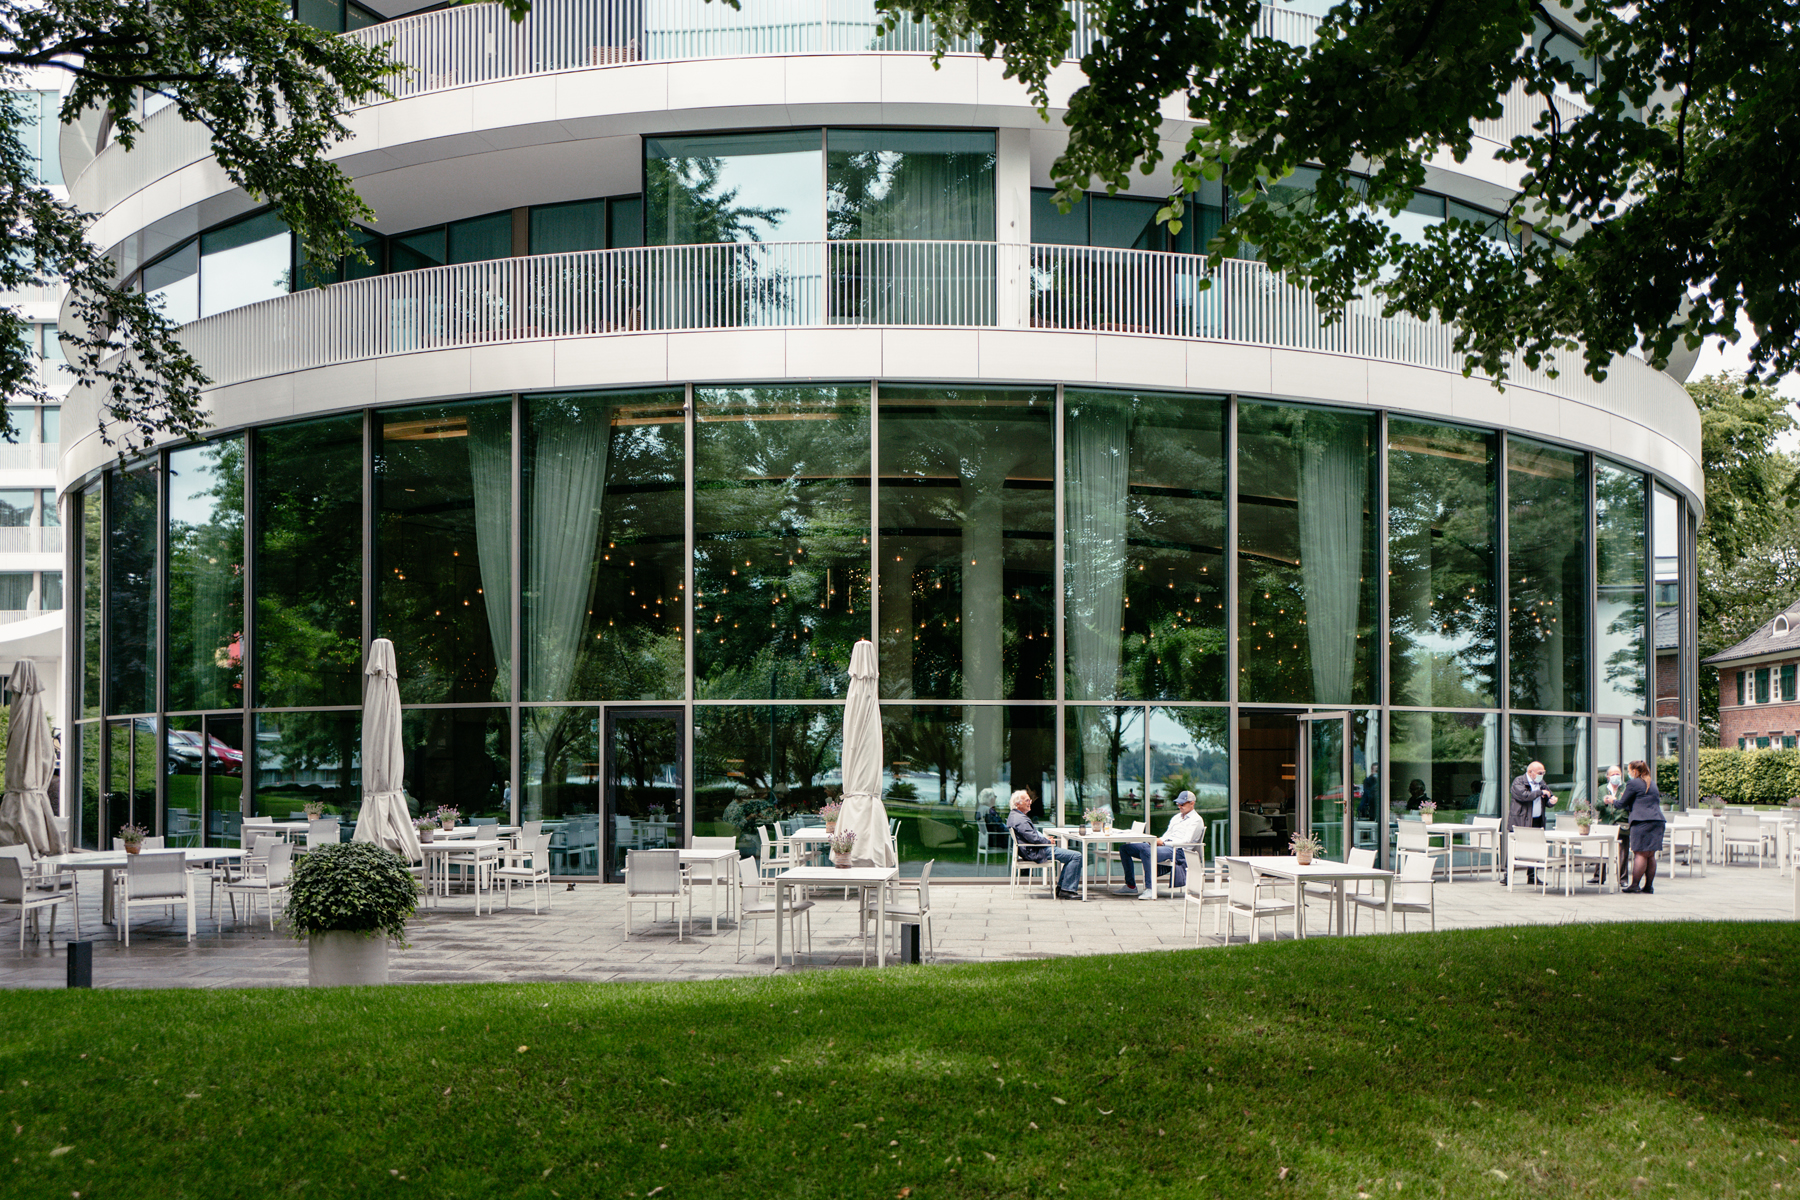 Geheimtipp Hamburg Rotherbaum Restaurant The Fontenay Parkview Dahlina Sophie Kock 046 (1)